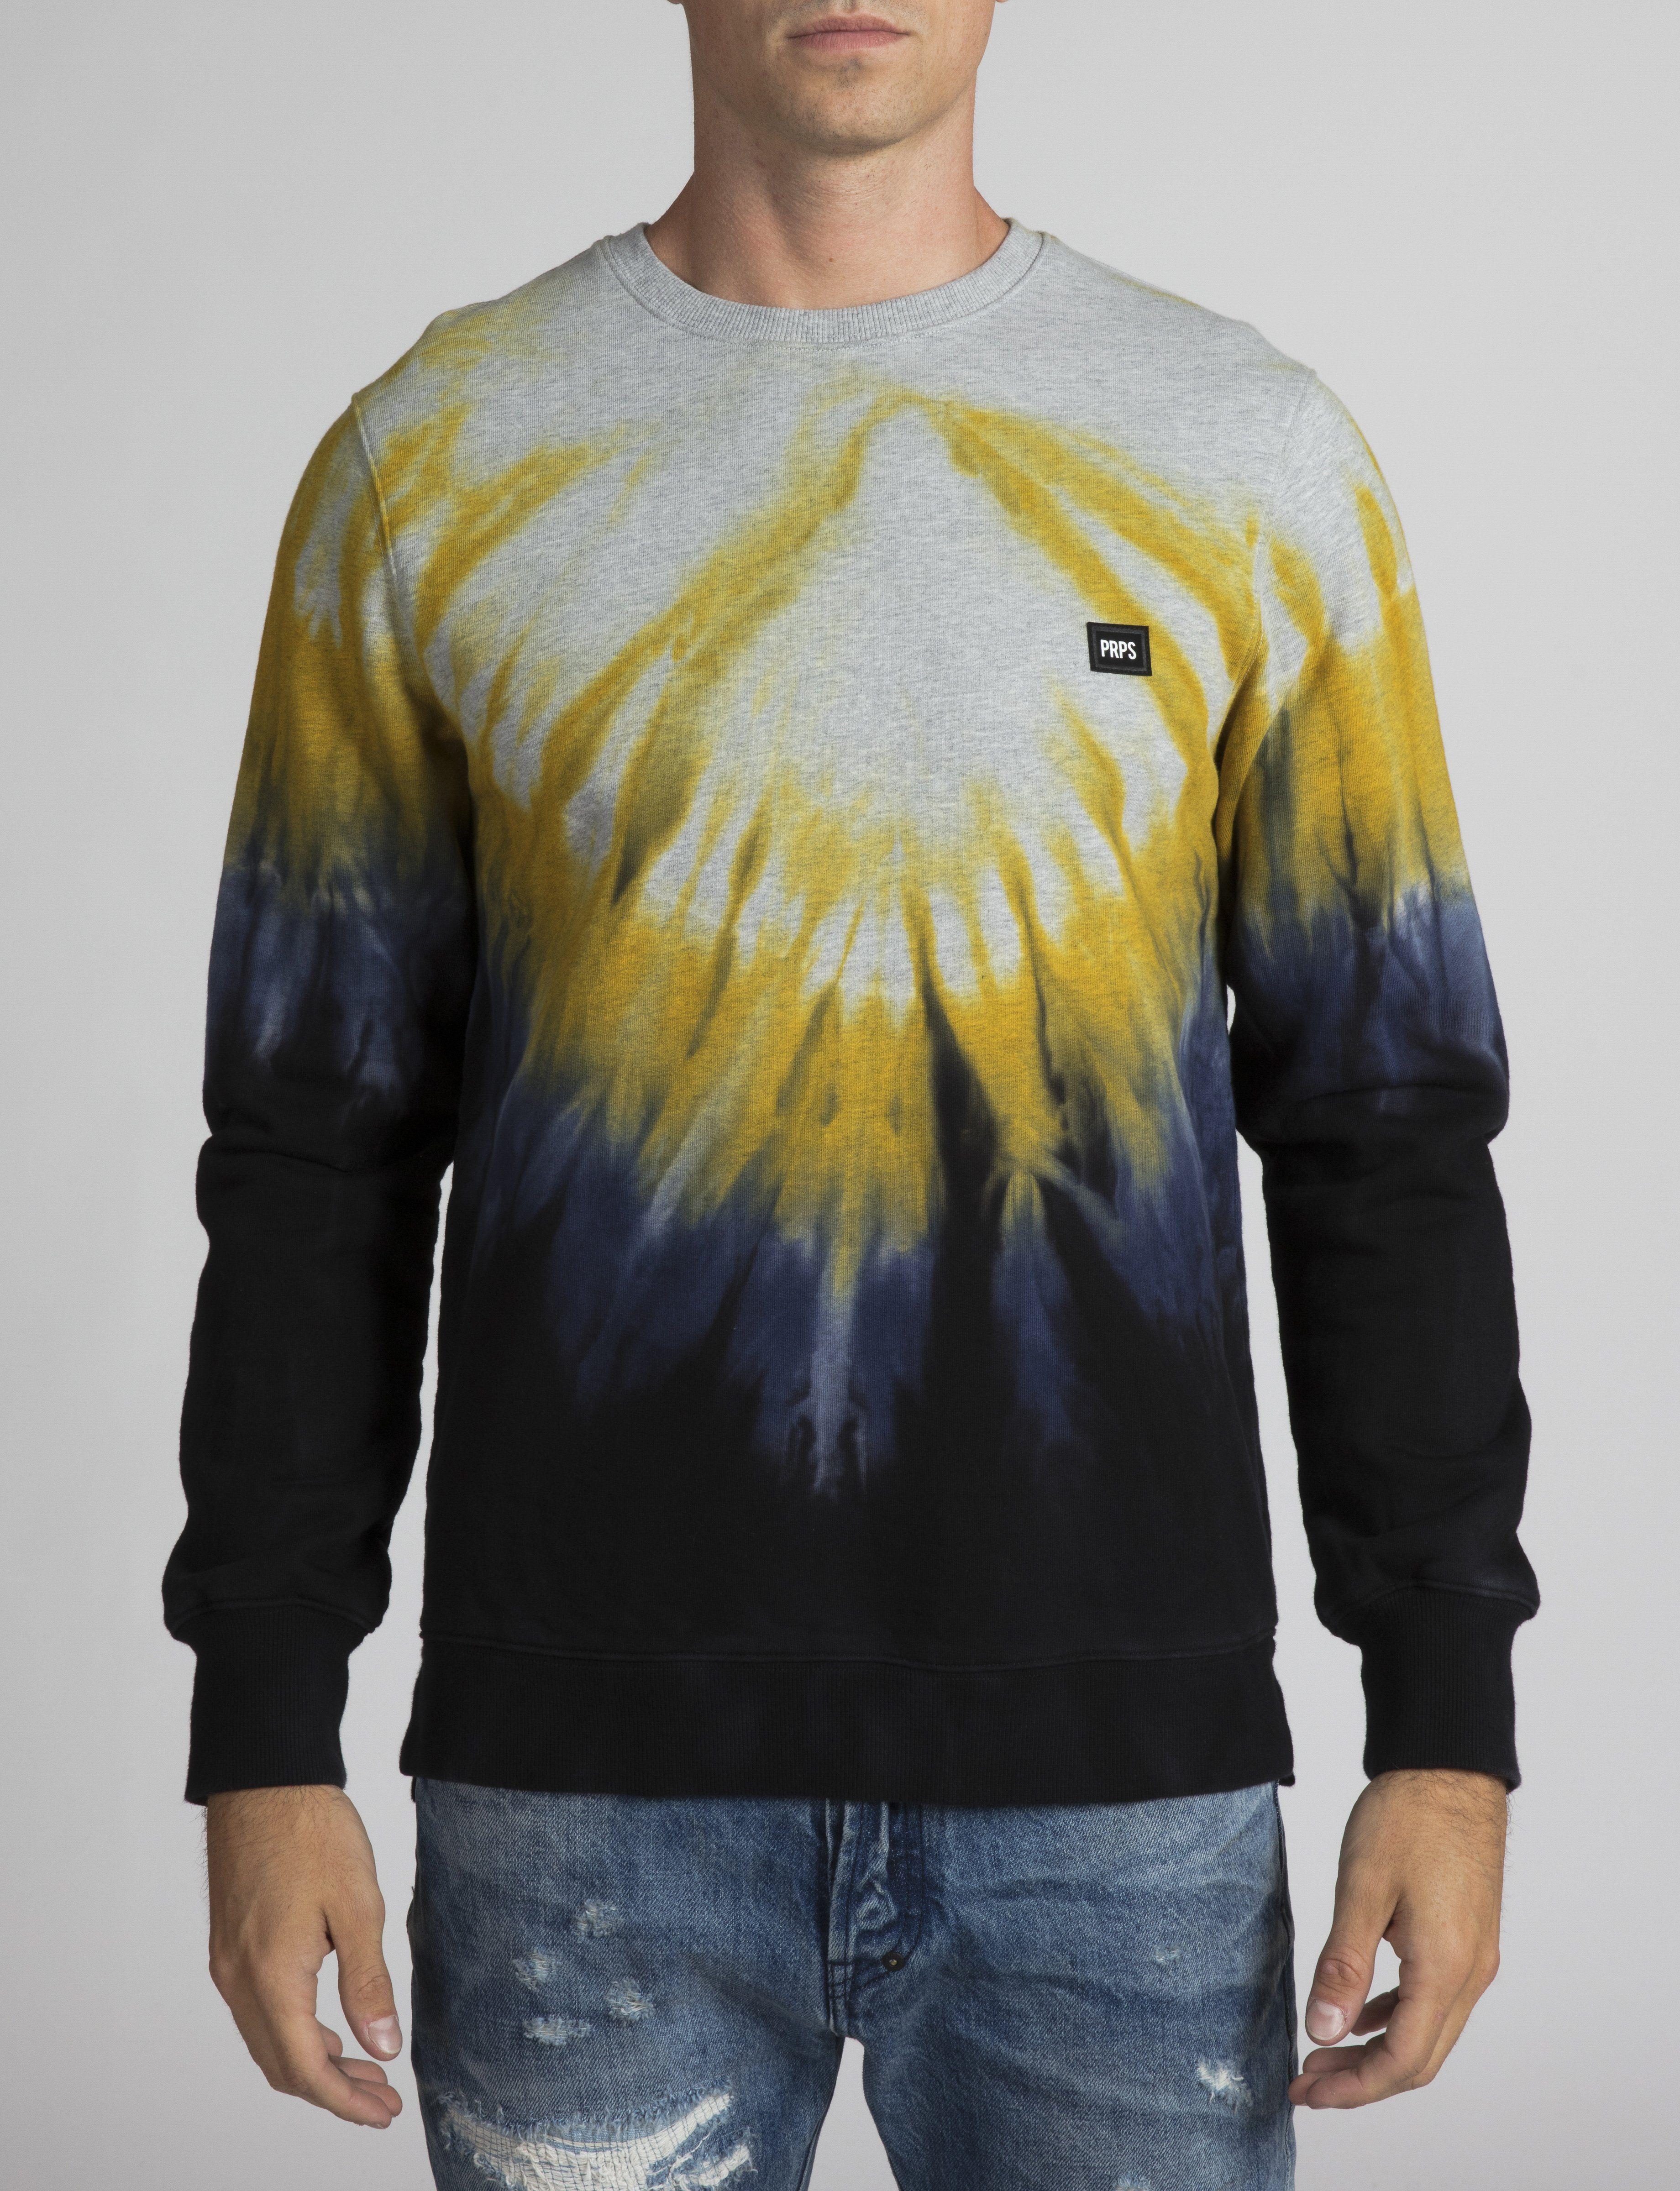 Tie Dye Pullover Inspirasi [ 4800 x 3680 Pixel ]